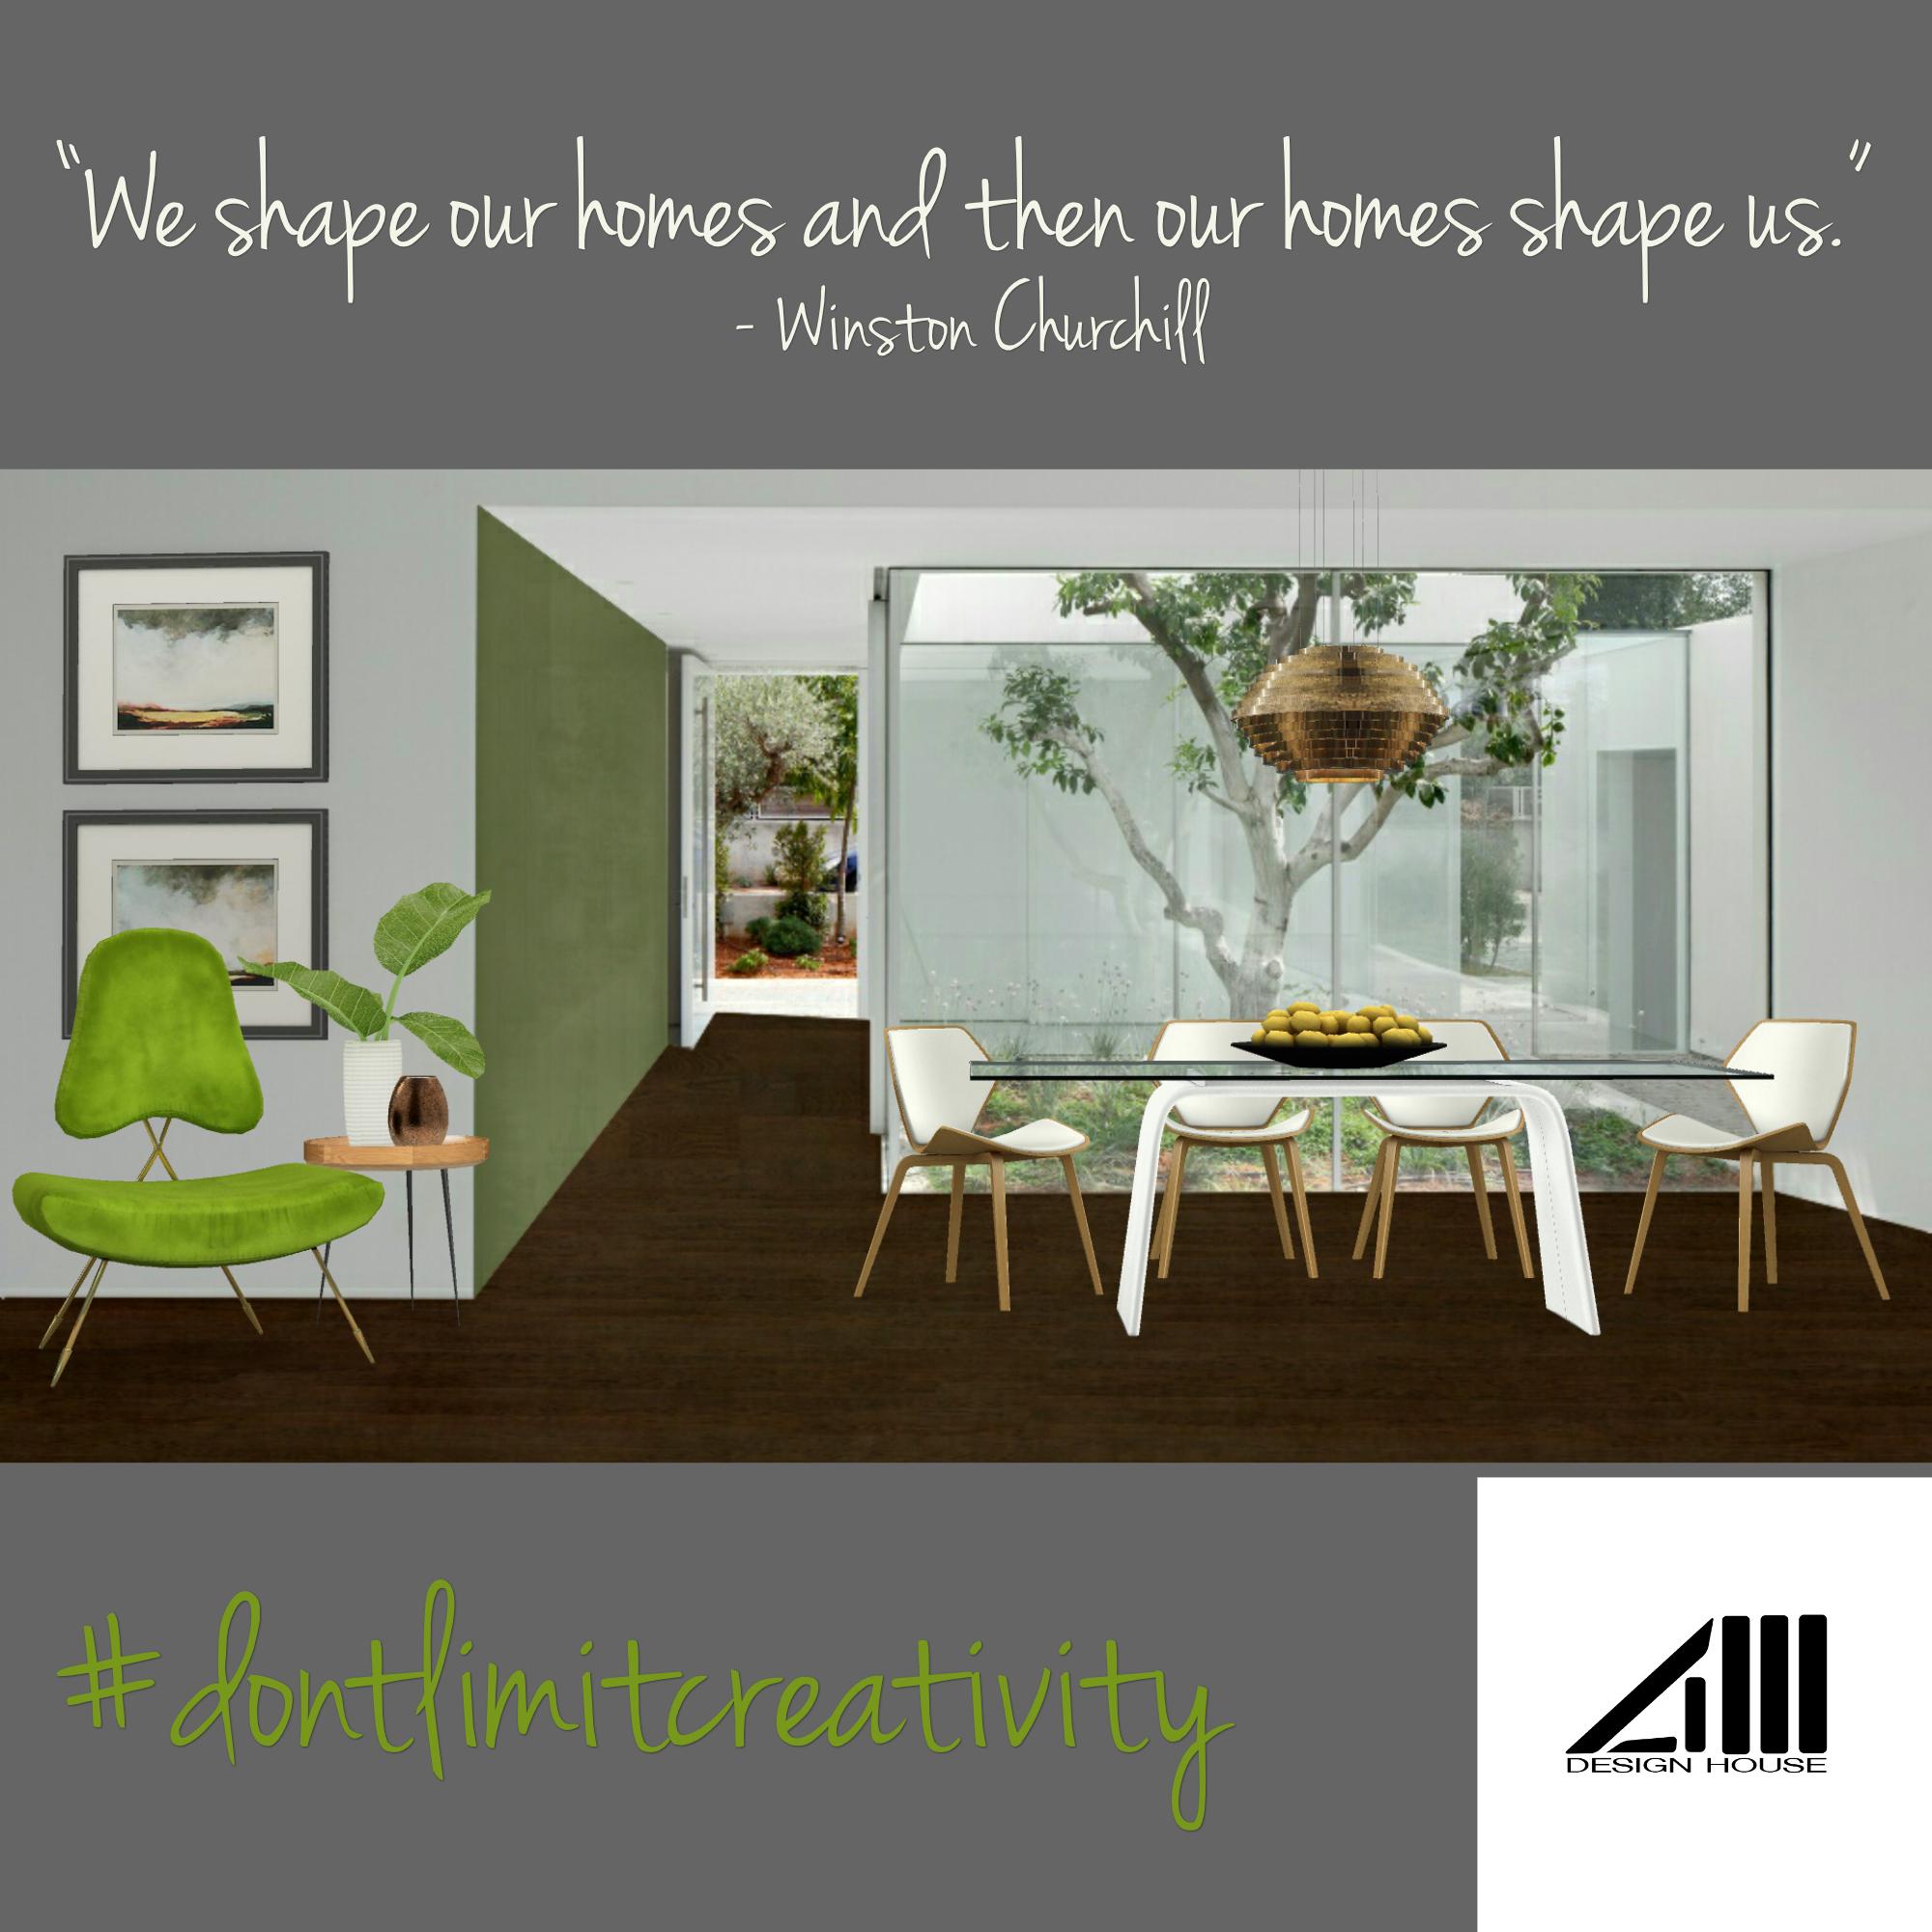 Greenery Interior Design Inspiration Quote Graphic Interior